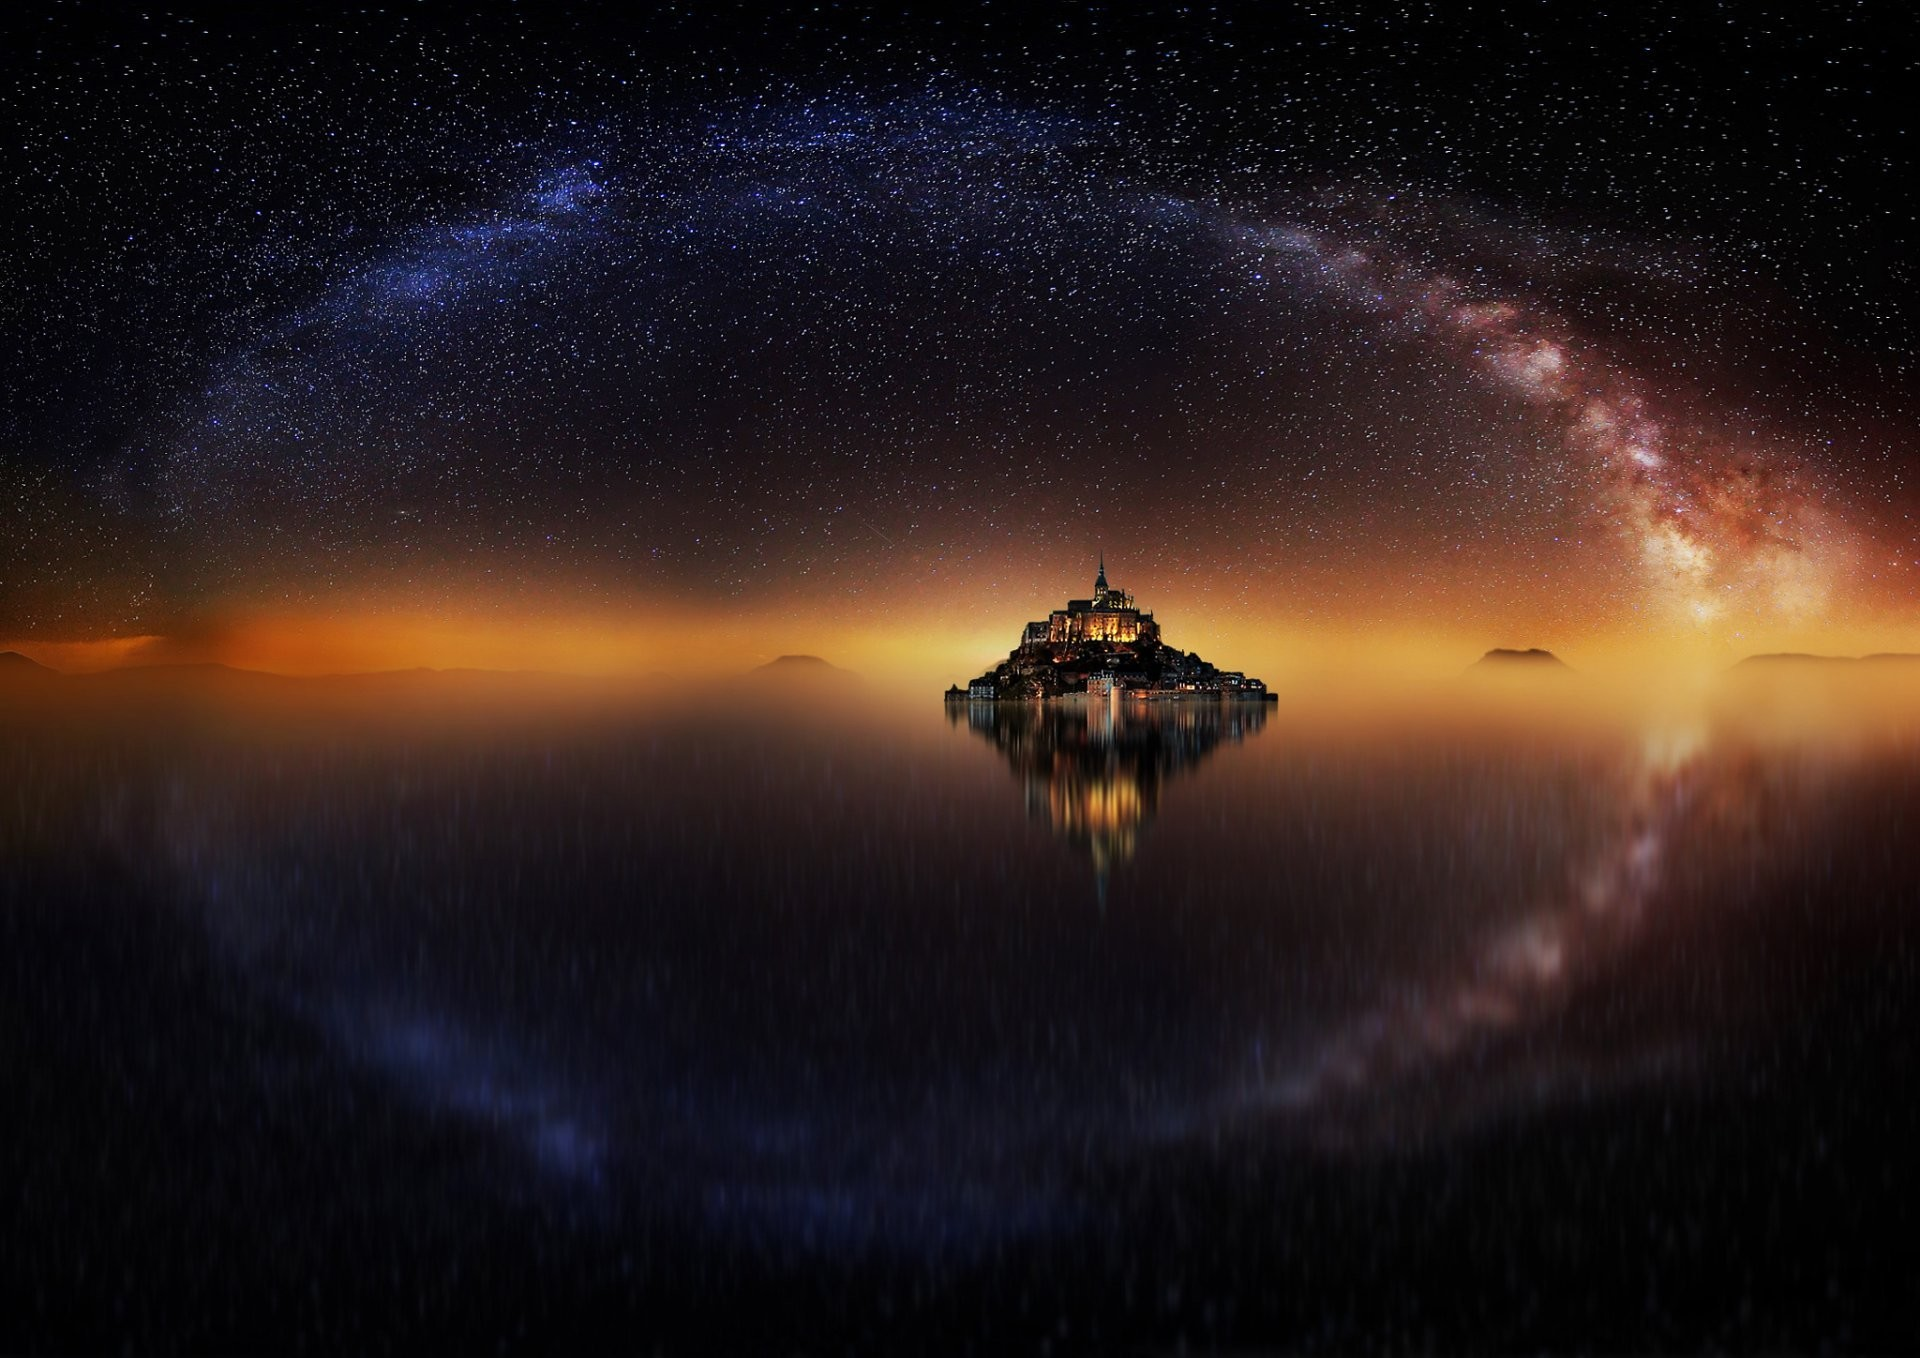 france island fortress mont -saint-michel mount michael the archangel night  star sky milky